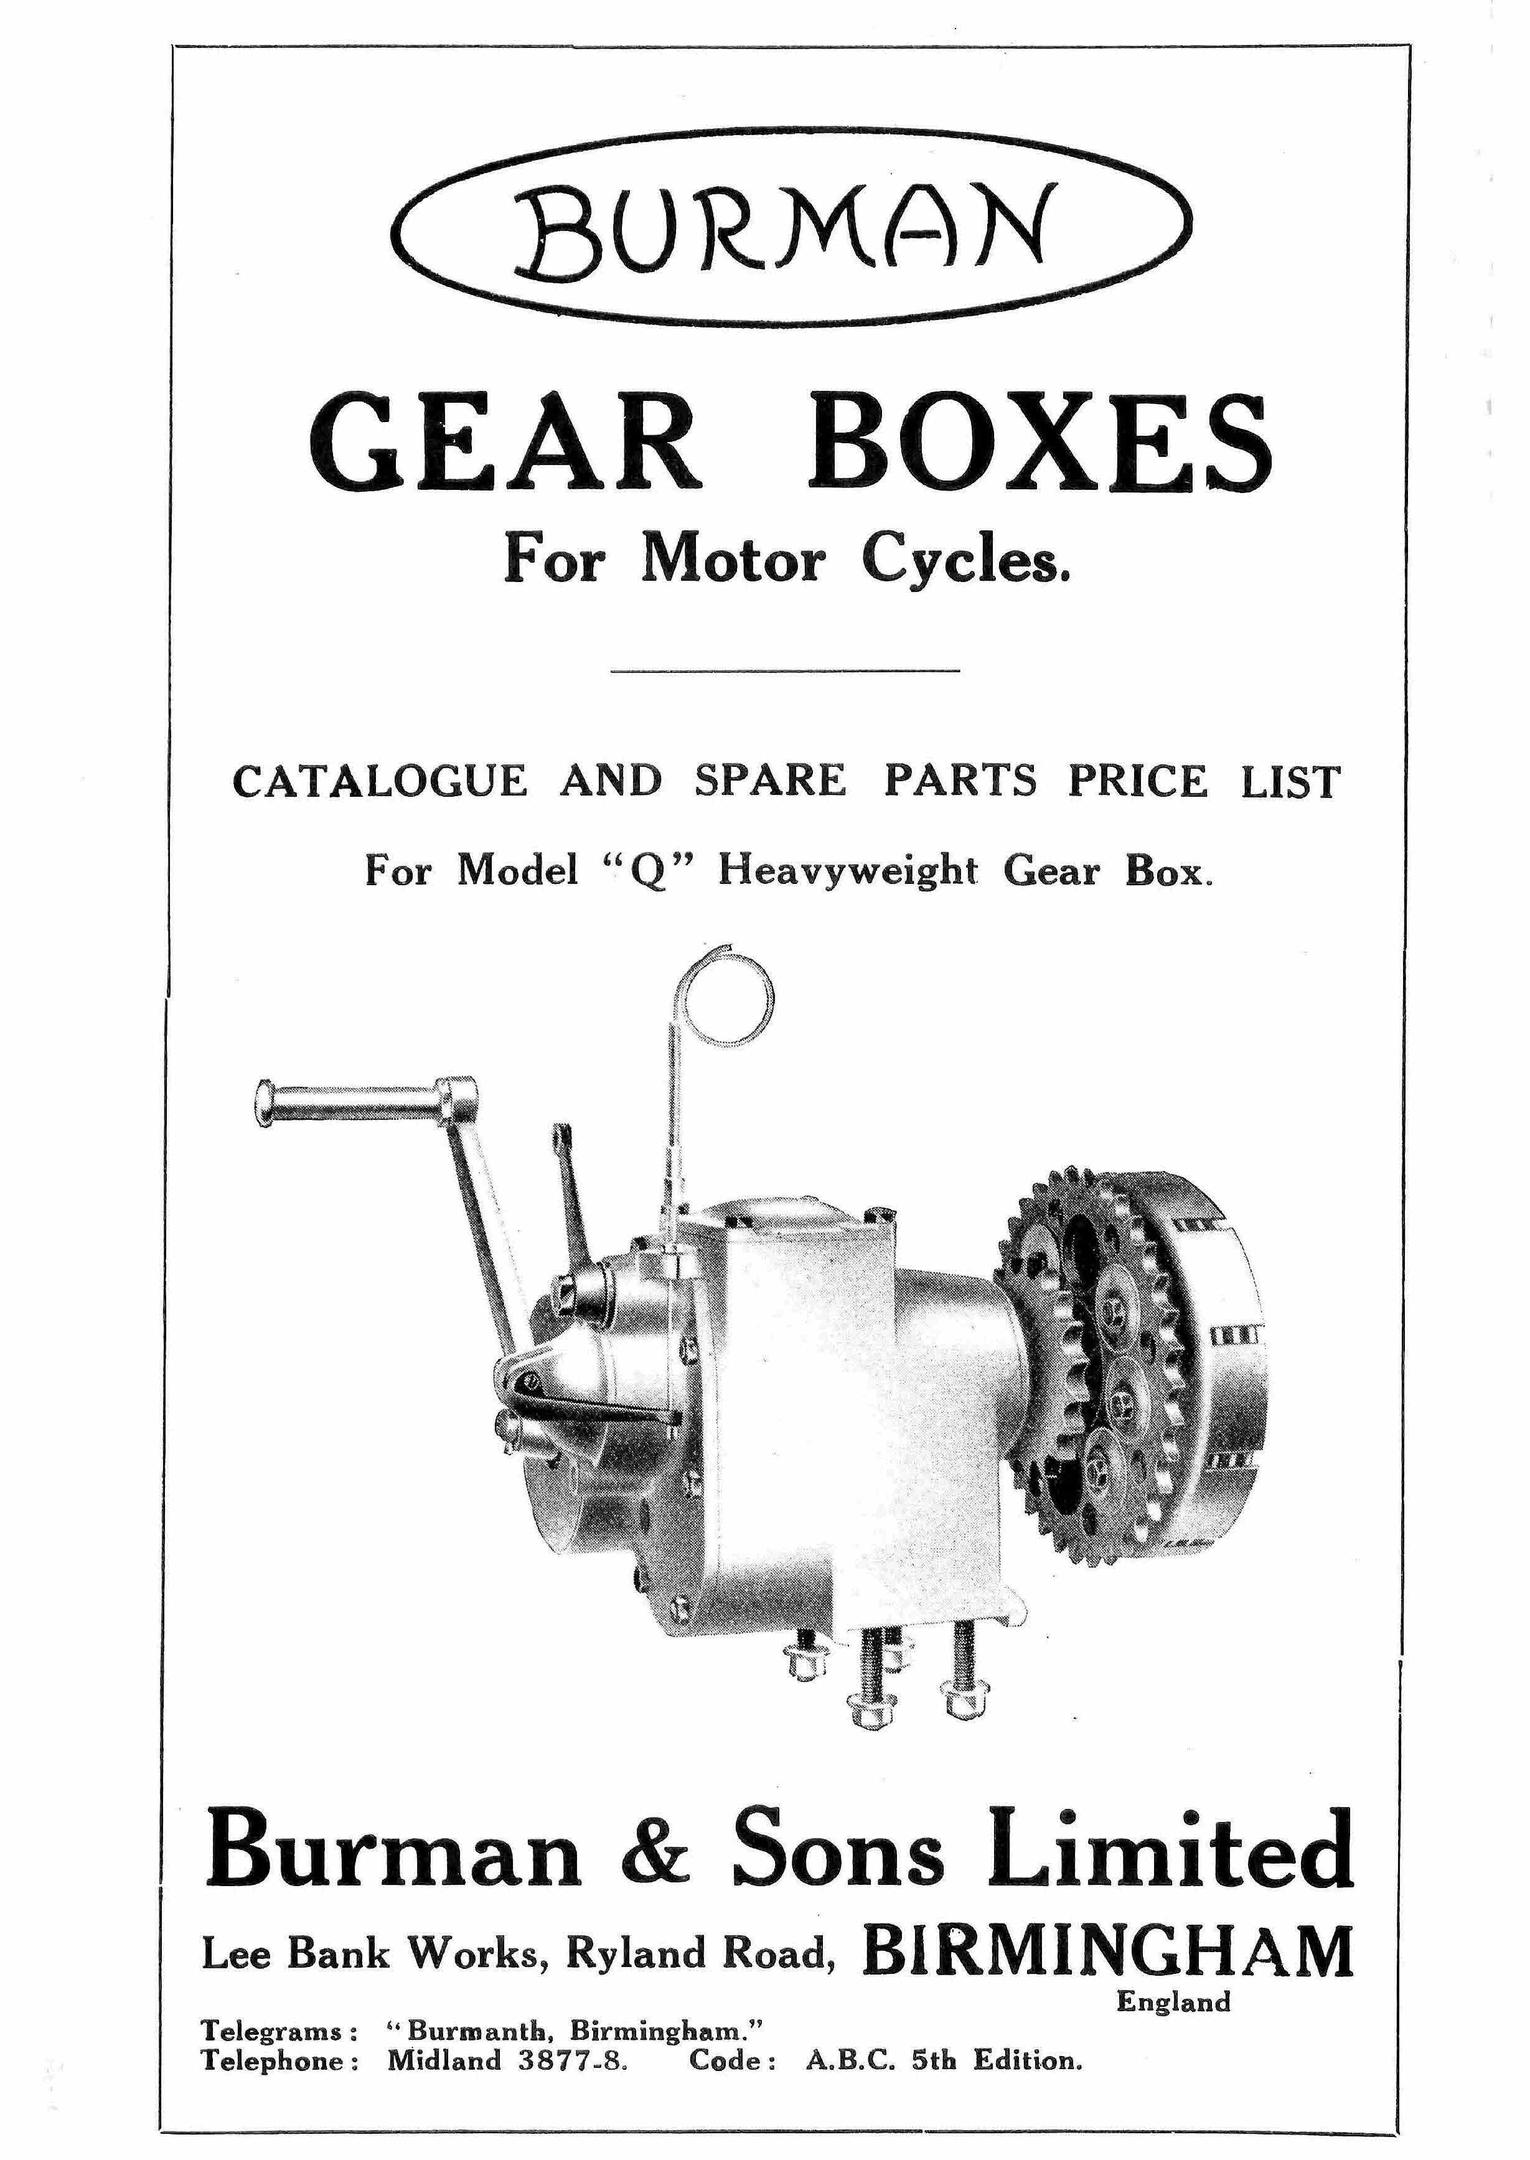 burman motorcycle gear box manuals themanualman mix gear box of motorcycle 19 [ 1530 x 2160 Pixel ]